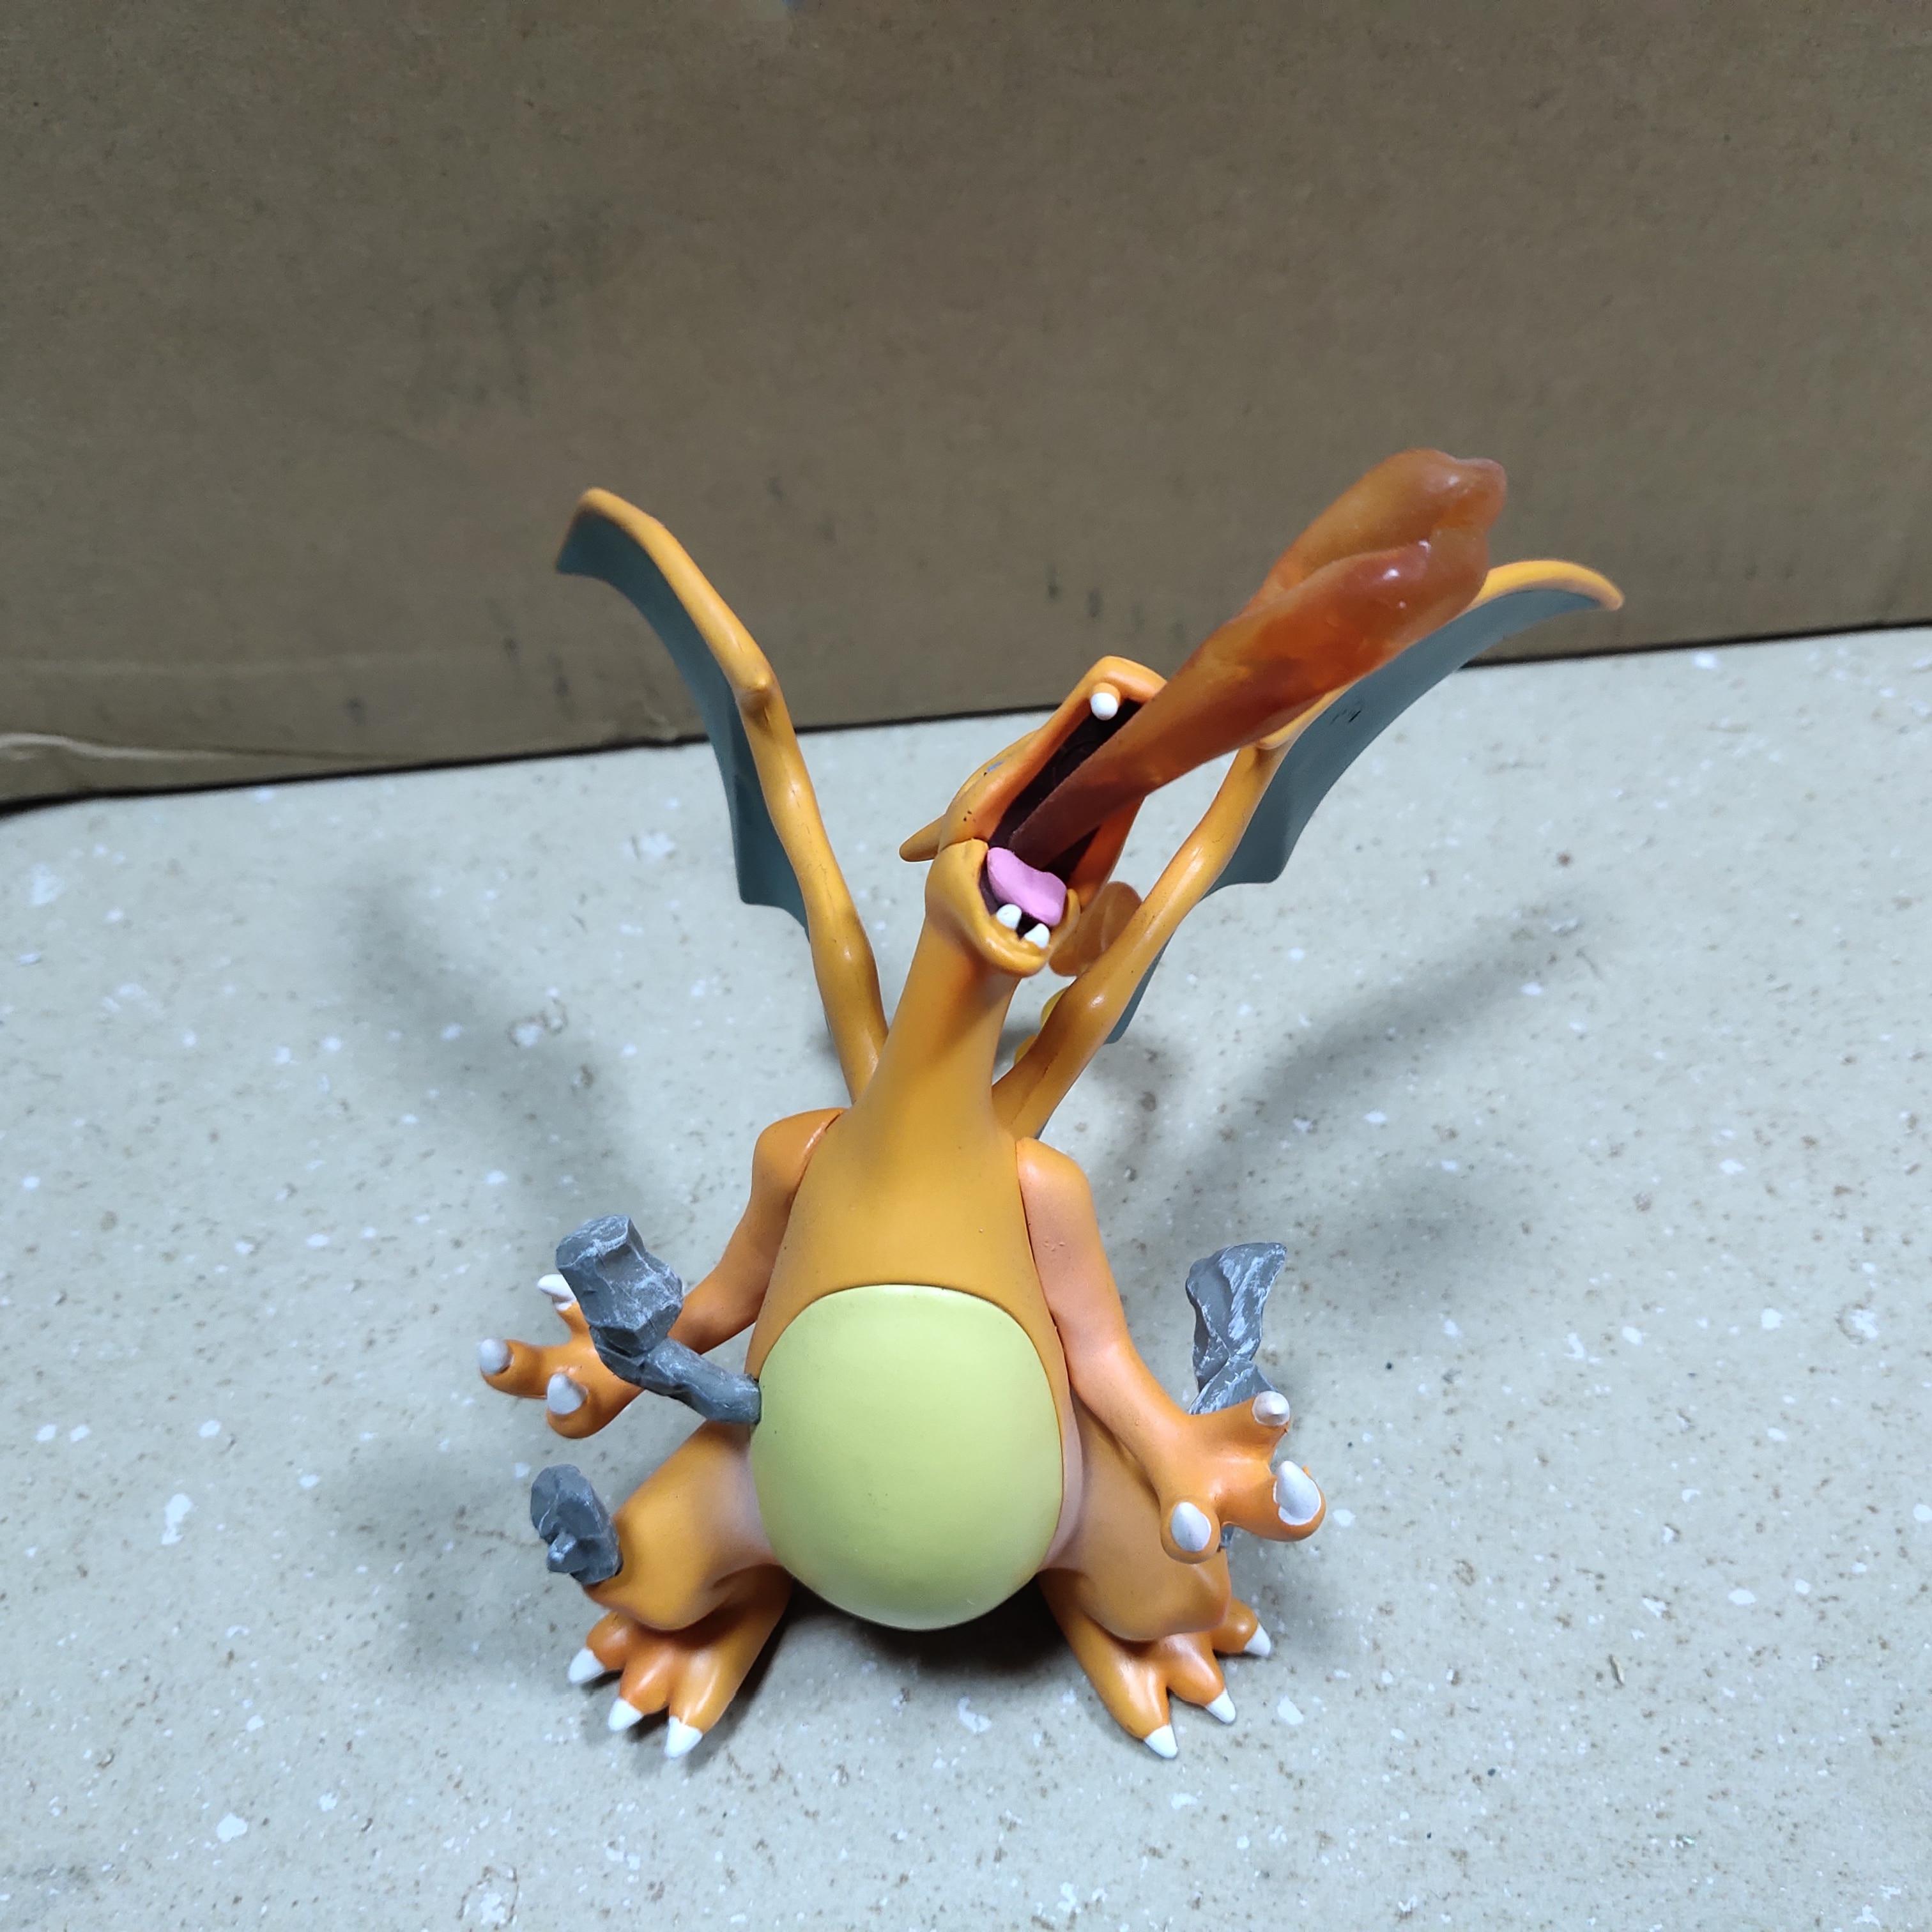 Pokemon Charizard PVC Action Figure Toy 120mm Anime Pokemon Game Charizard Figurine Toys Diorama